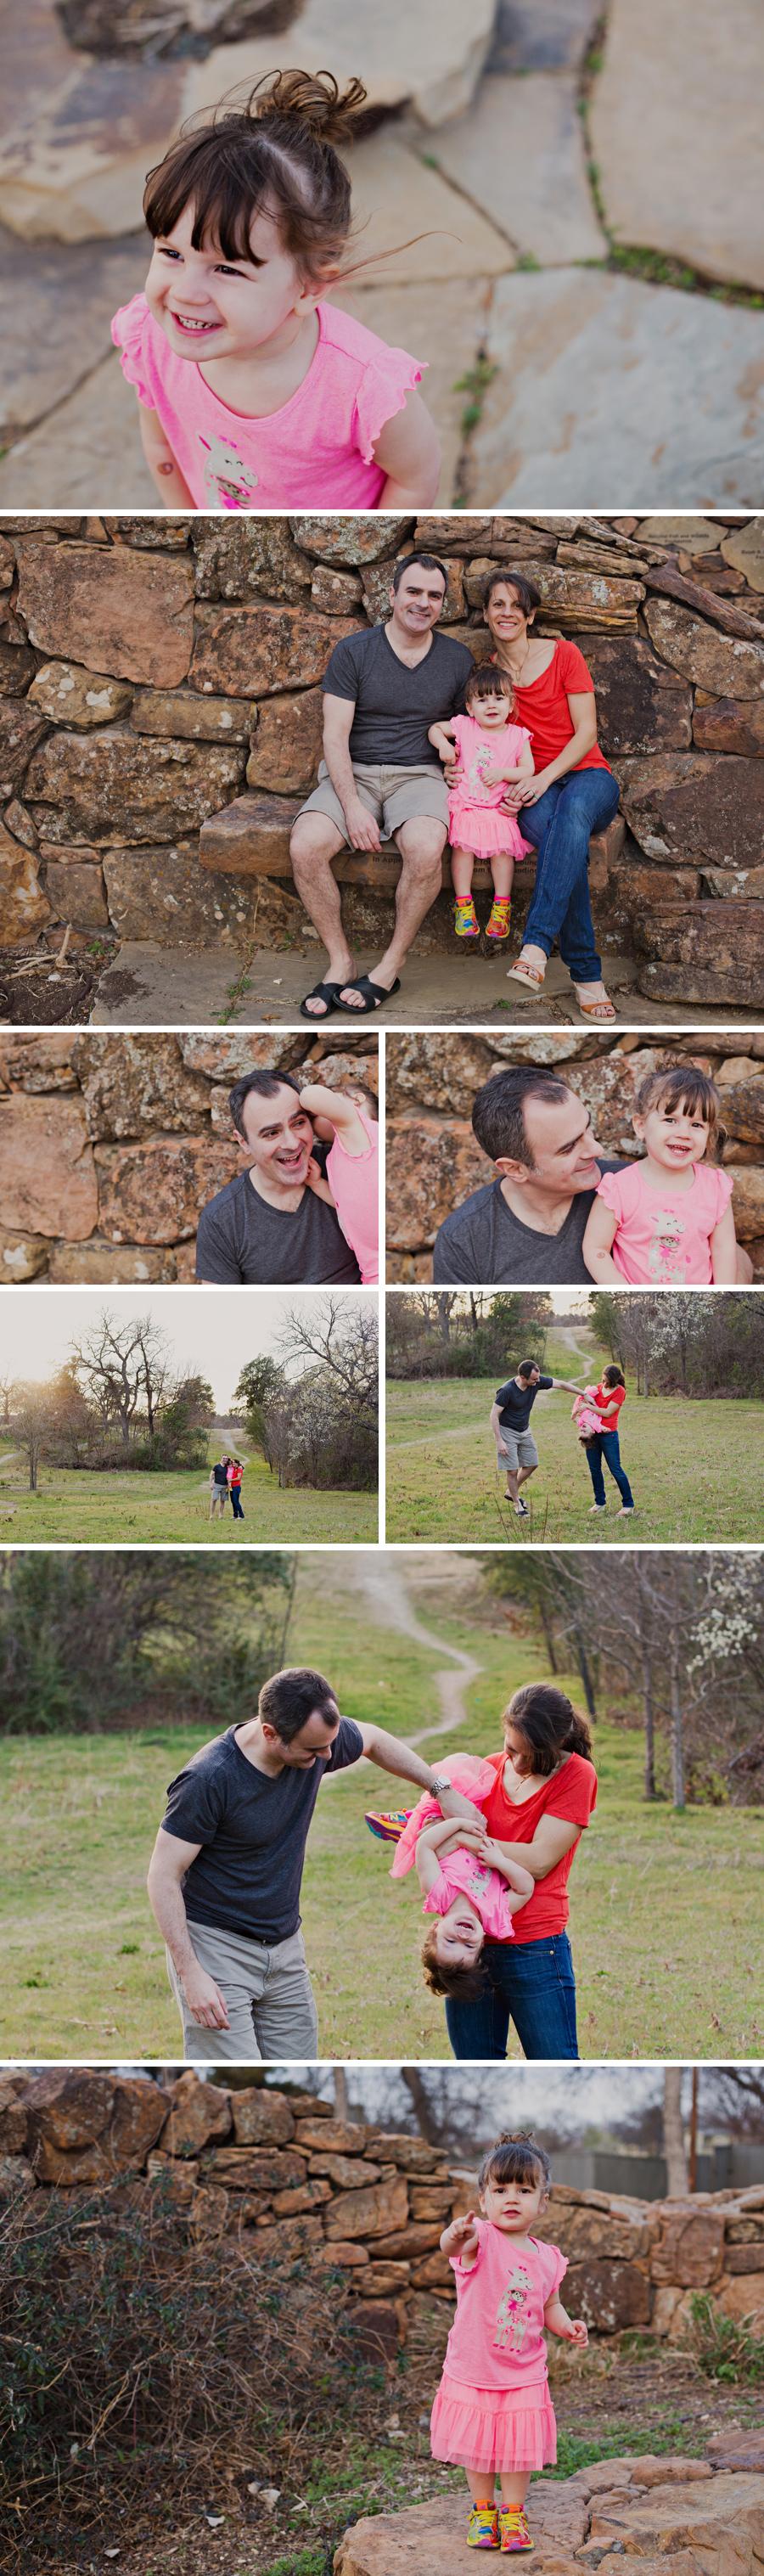 Dallas-Family-Photographerc017